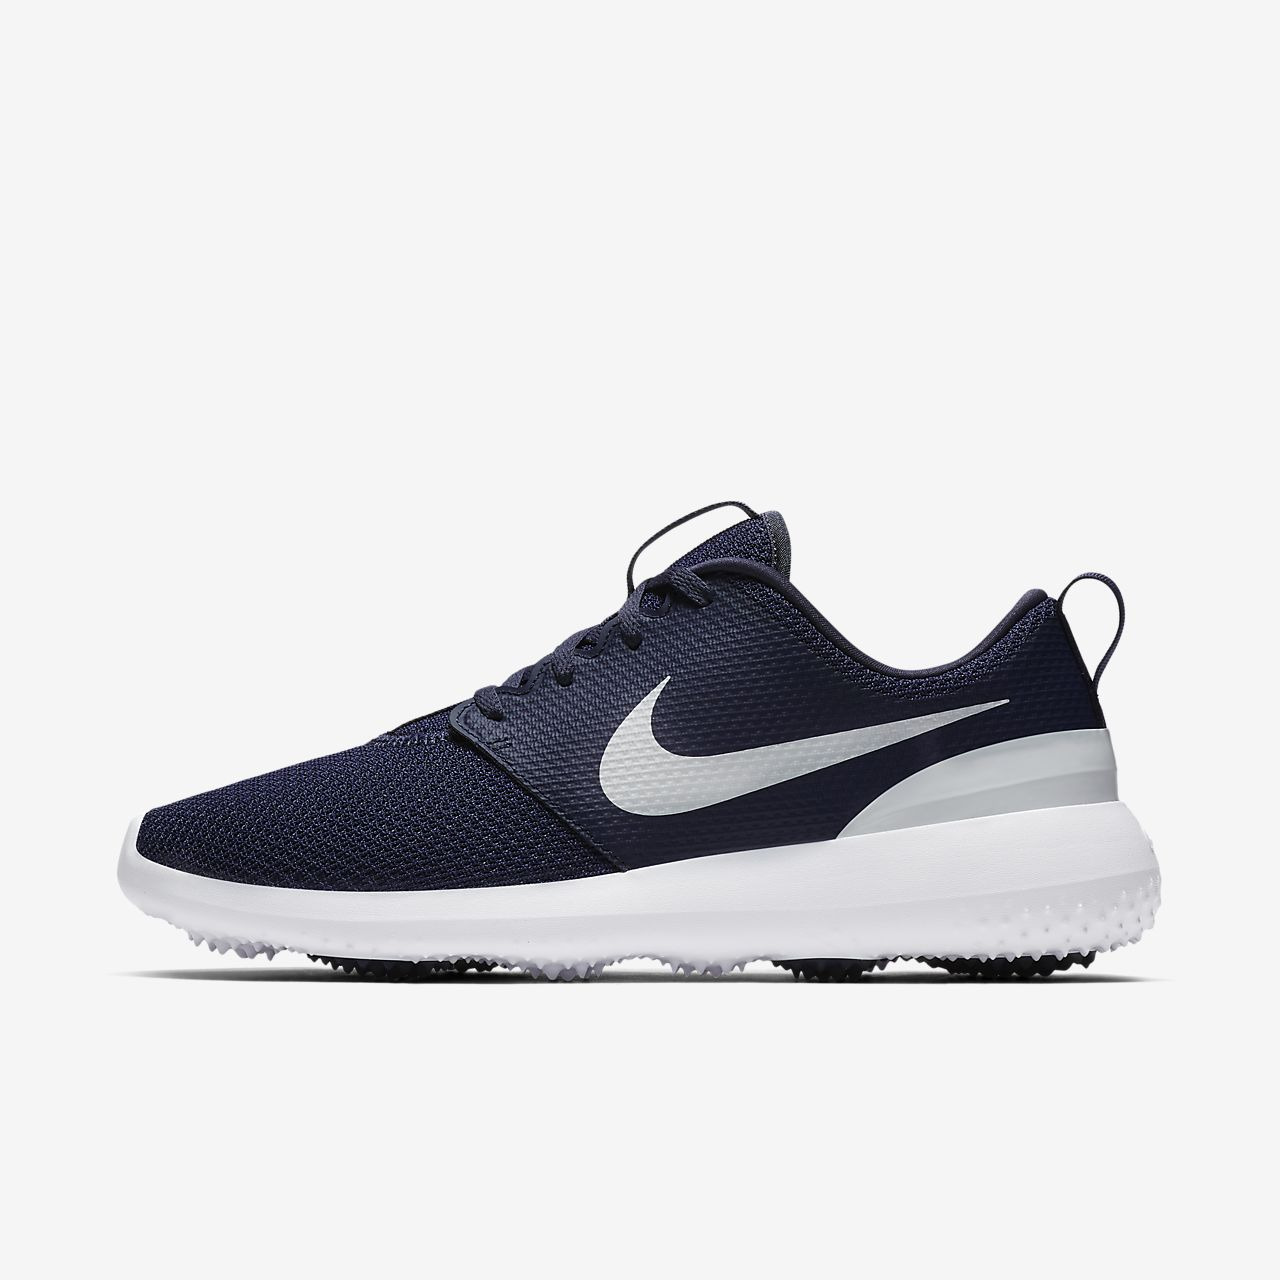 ... Chaussure de golf Nike Roshe G pour Homme